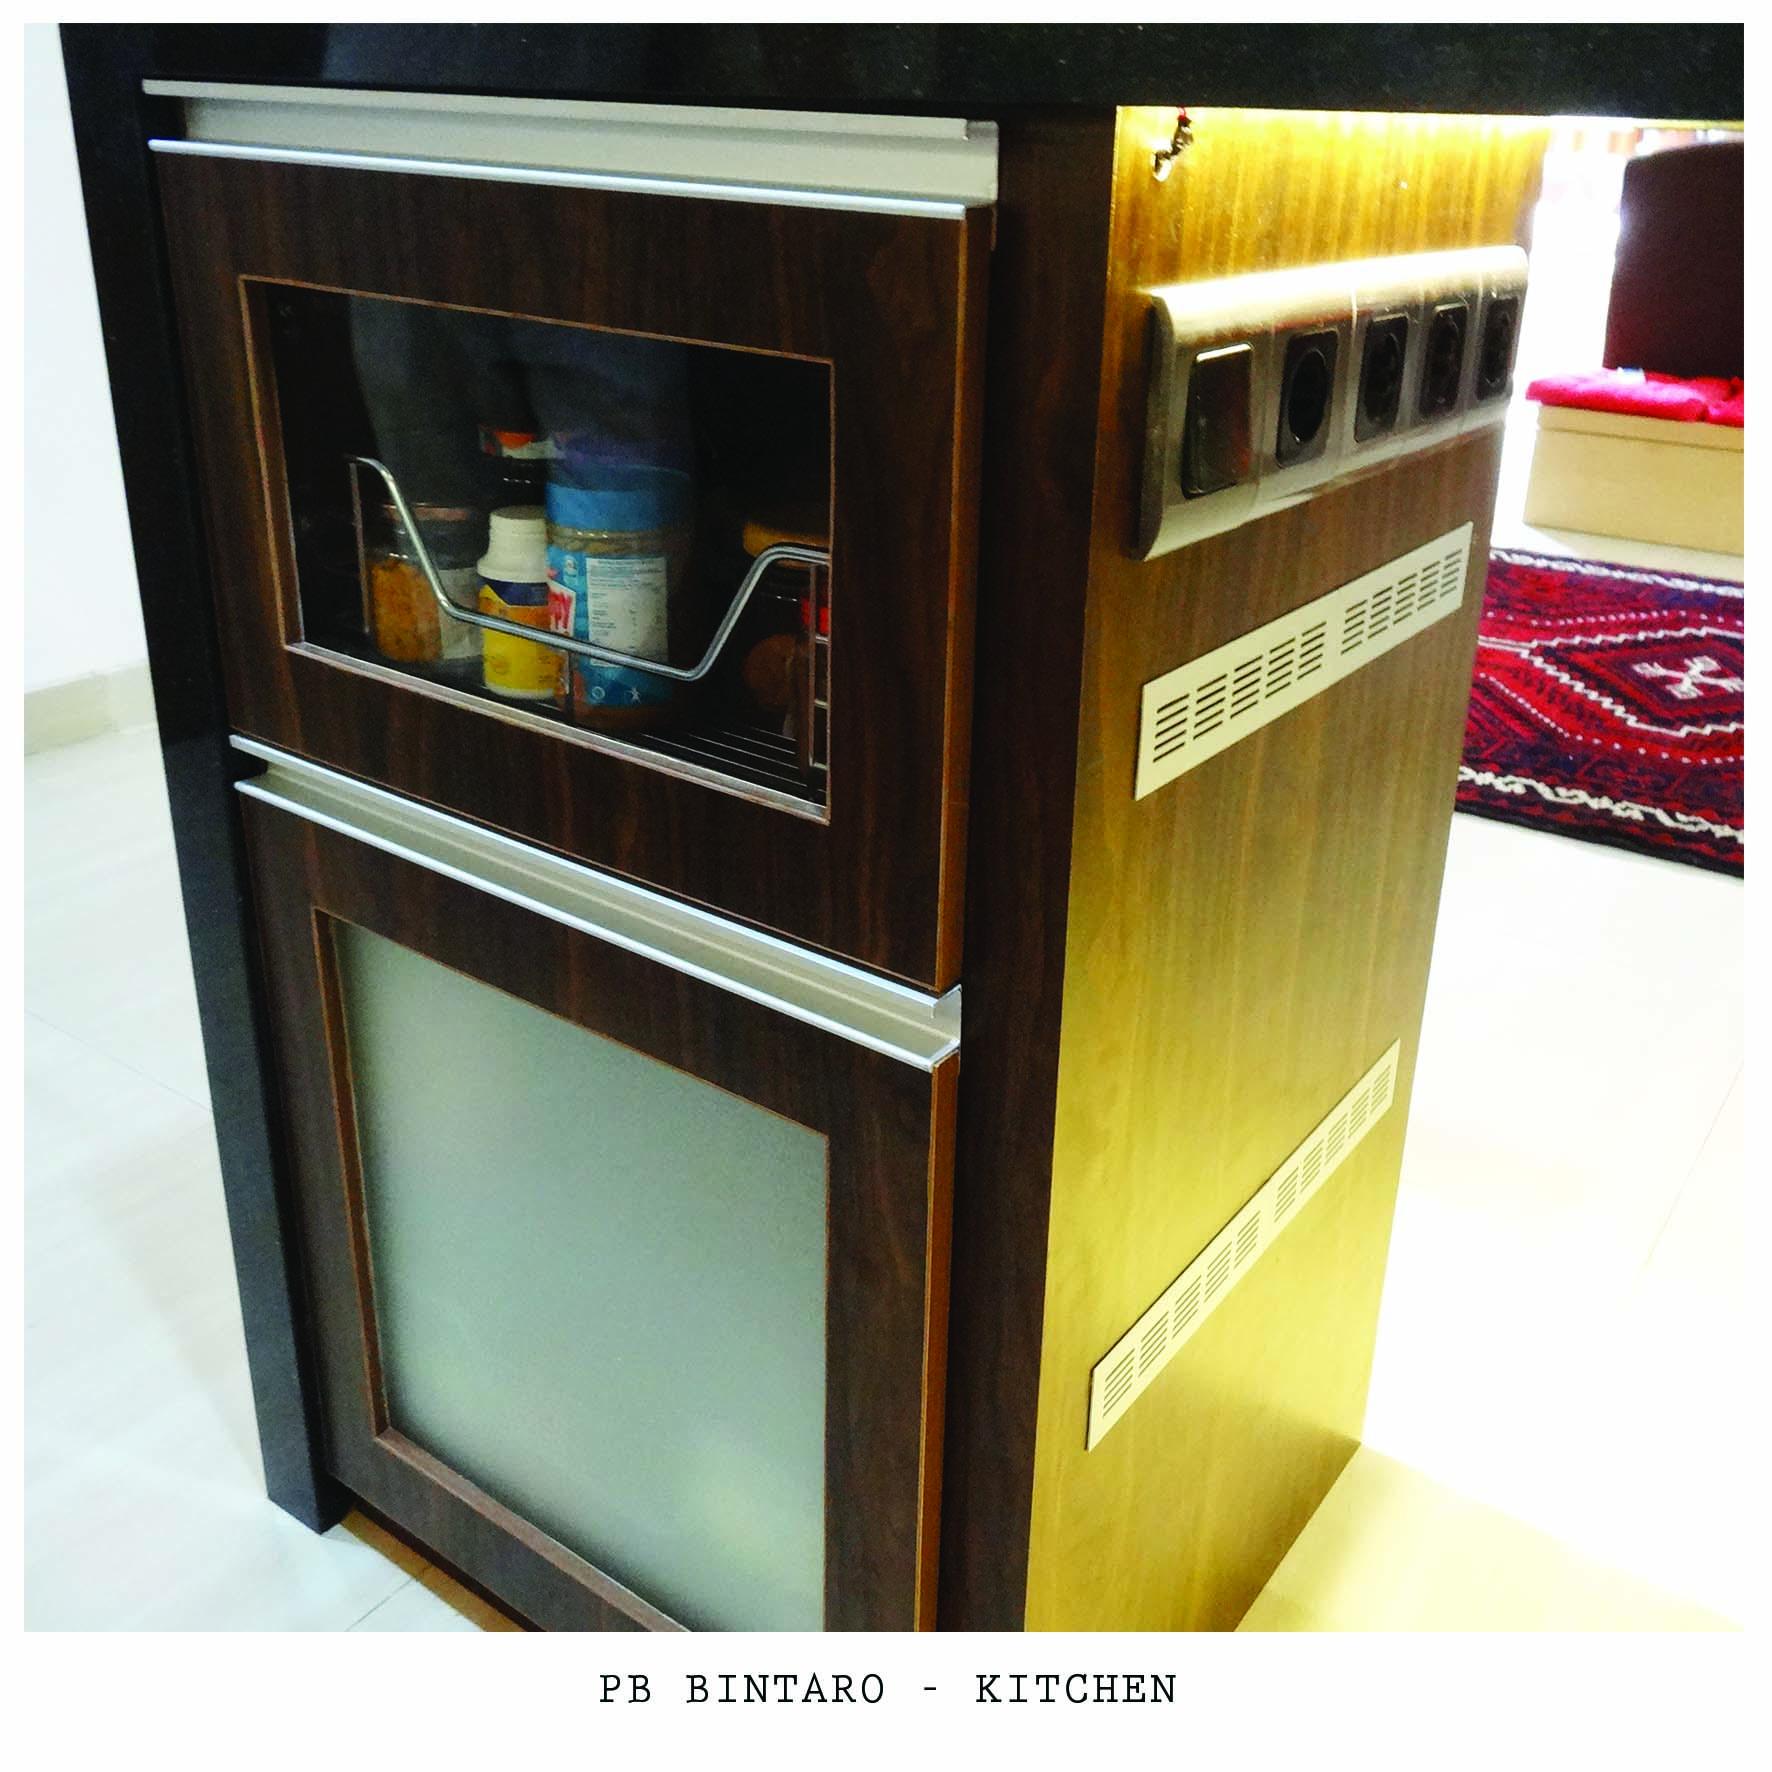 X3M Architects Pb 6 House Bintaro Bintaro X3M-Architects-Pb-6-House  75955